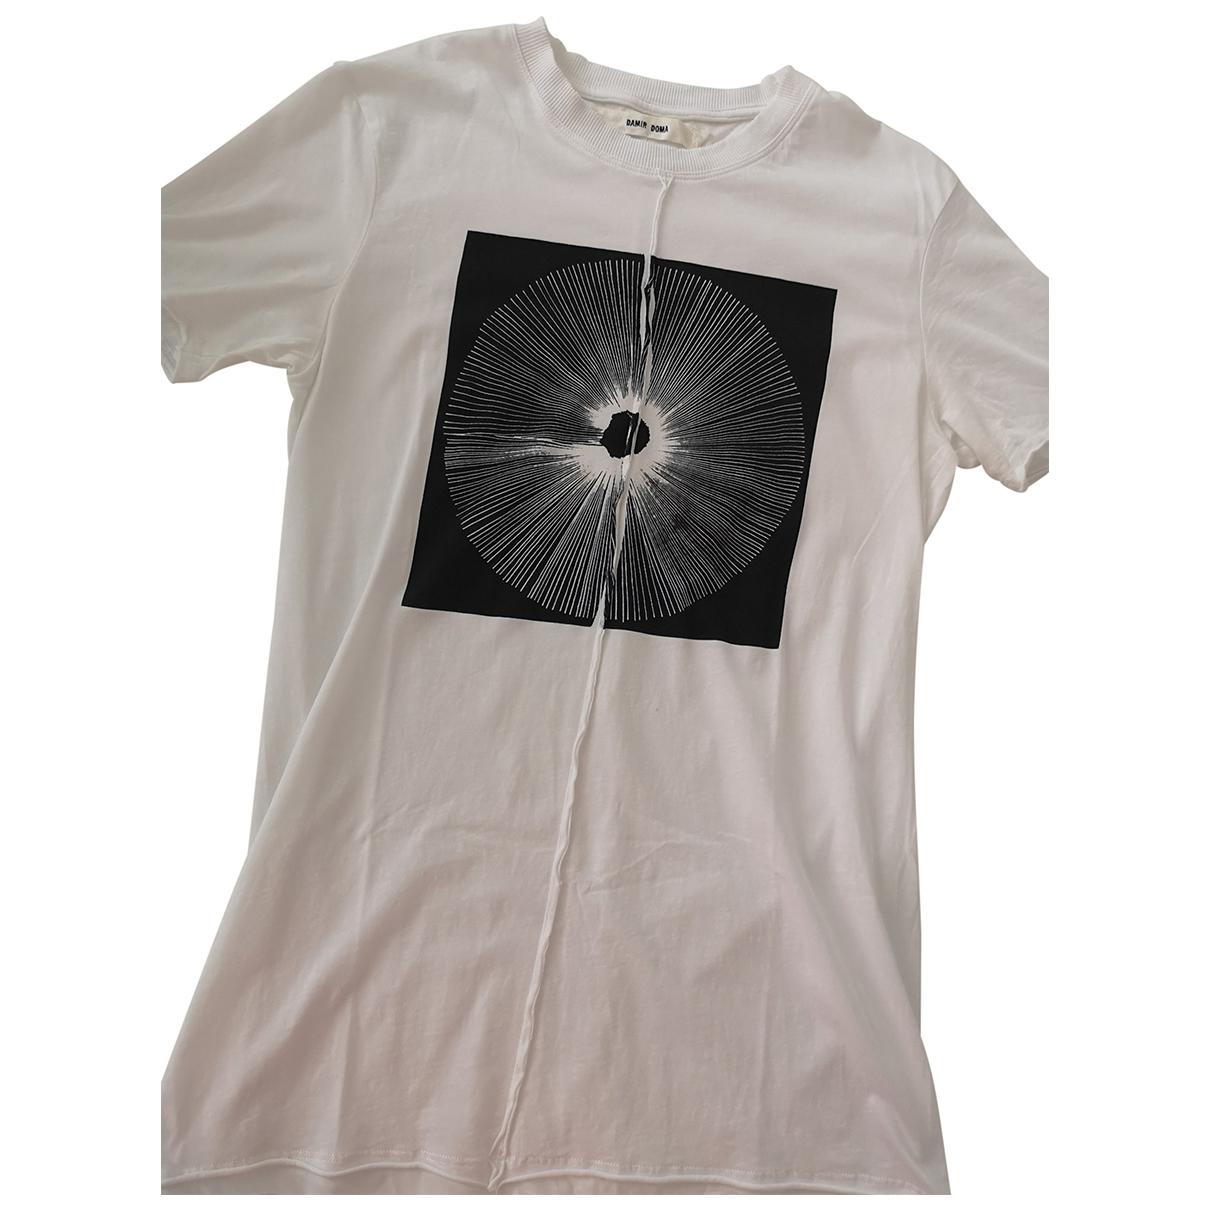 Damir Doma - Tee shirts   pour homme en coton - blanc